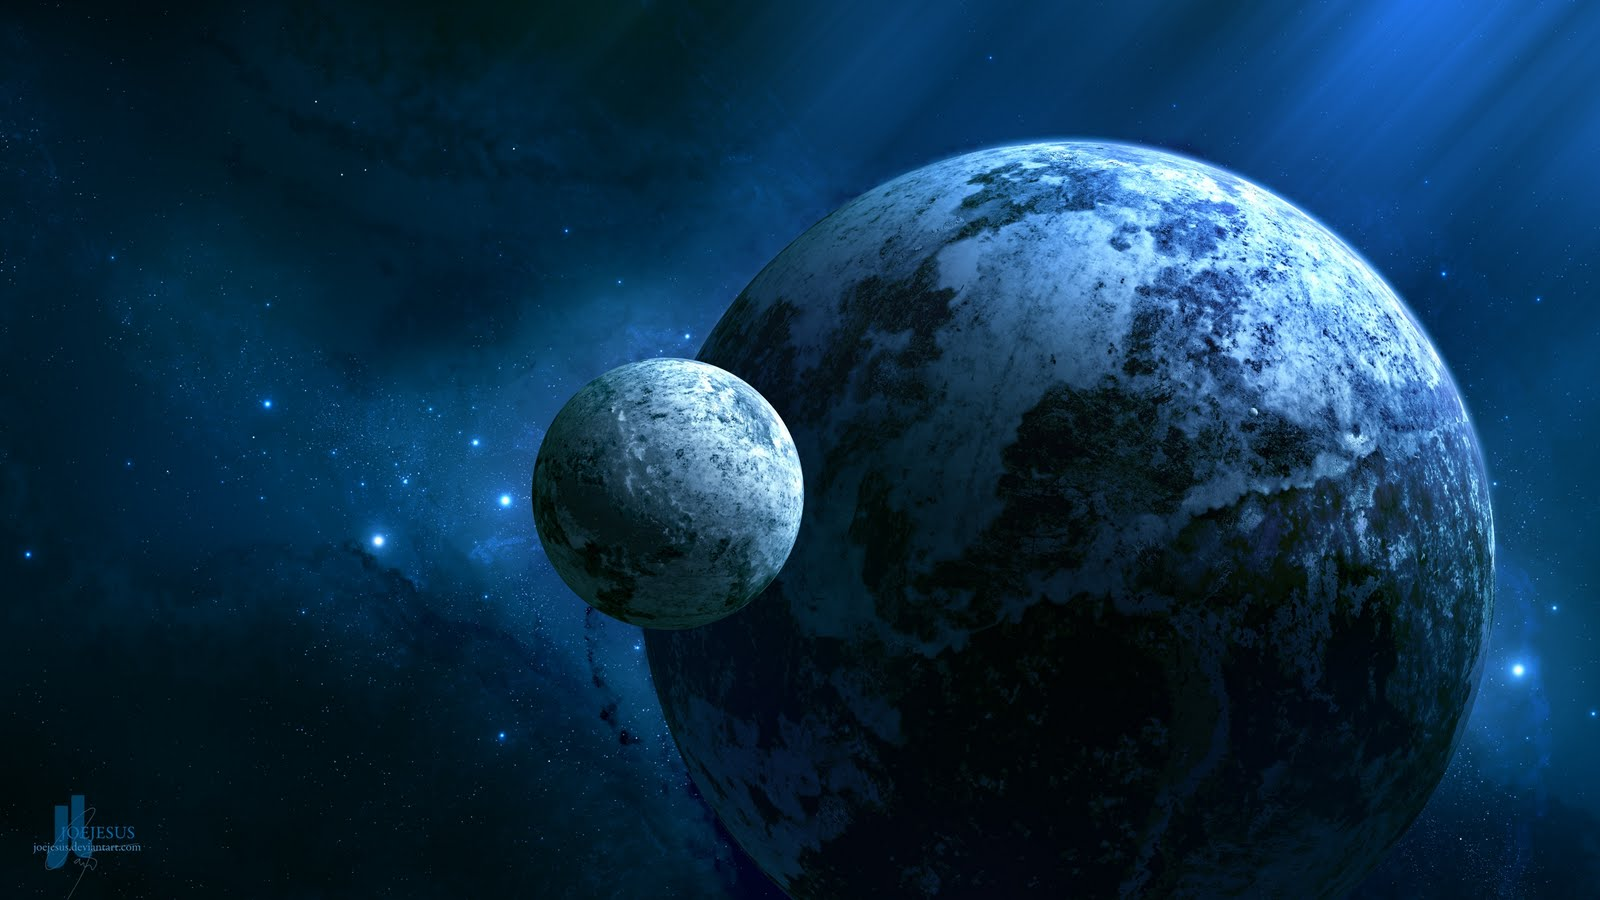 http://1.bp.blogspot.com/-gSBb6ImPgpw/TlOOh6_99OI/AAAAAAAAAJ8/Lgt3-LtbEk0/s1600/glimpse_of_universe-2560x1440.jpg